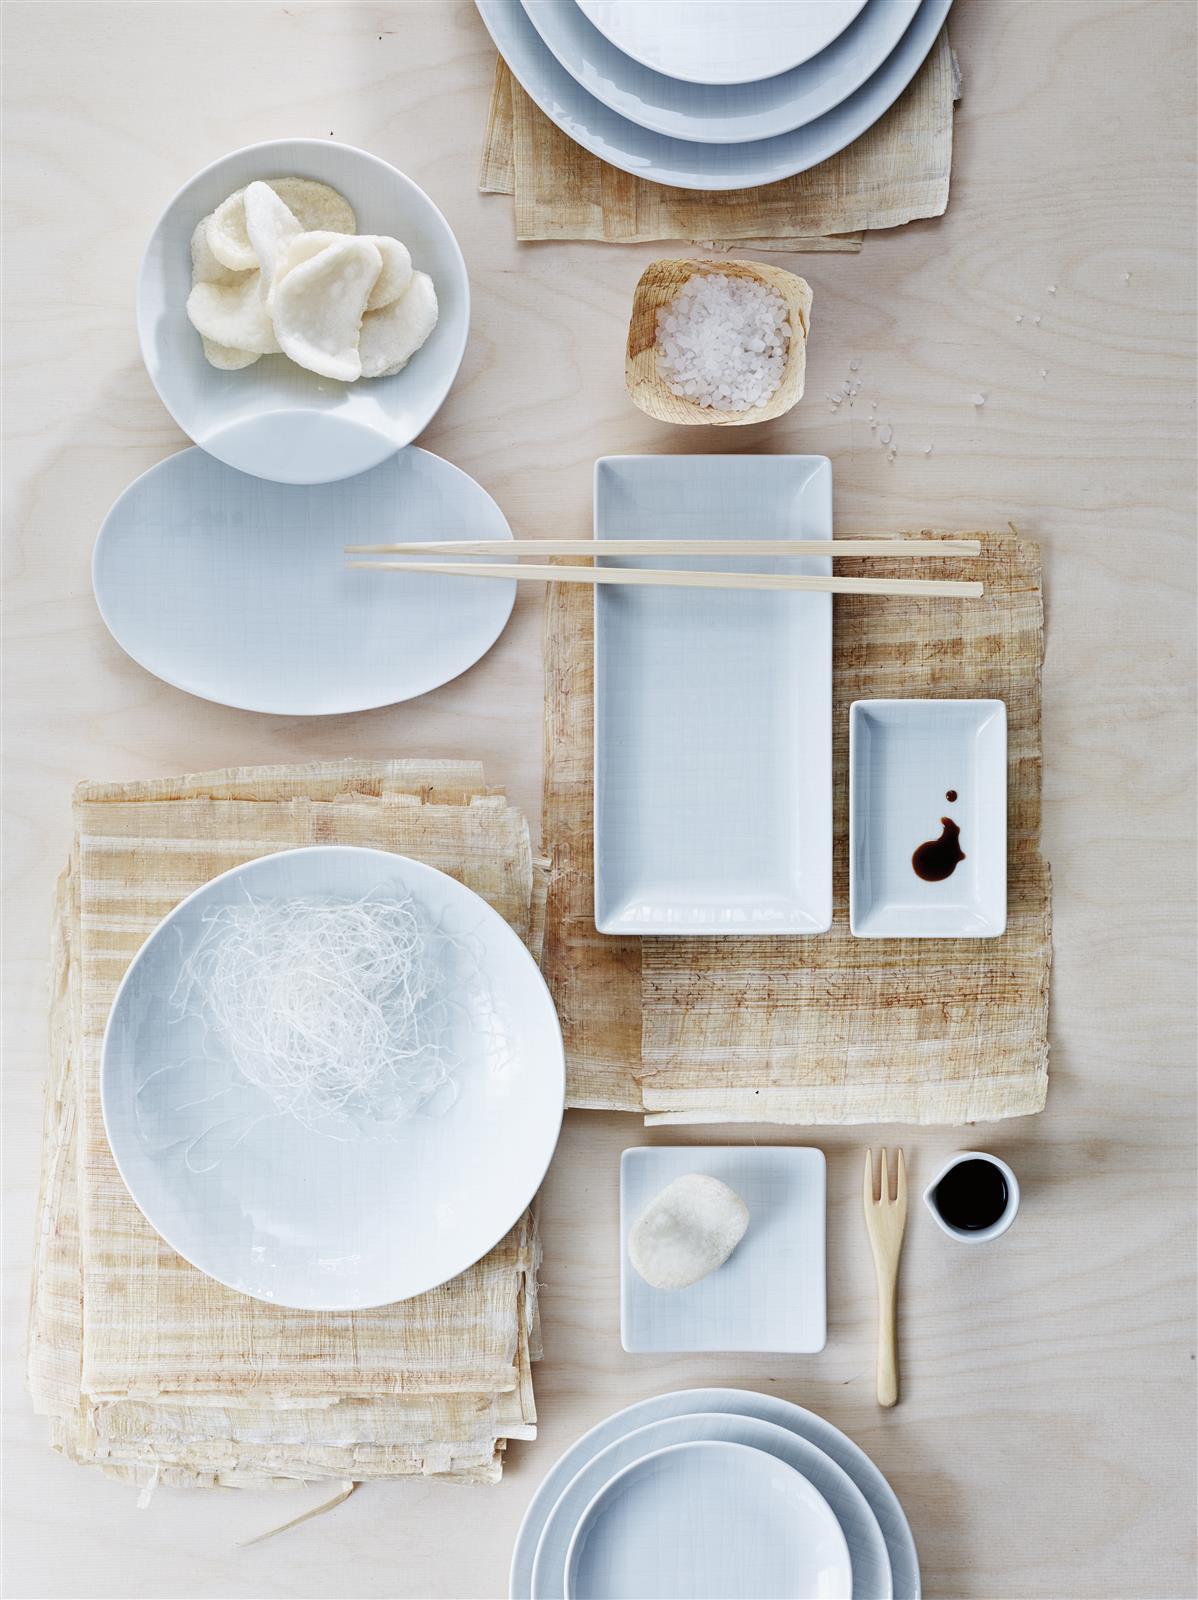 geschirr set mesh 16 teilig von rosenthal. Black Bedroom Furniture Sets. Home Design Ideas